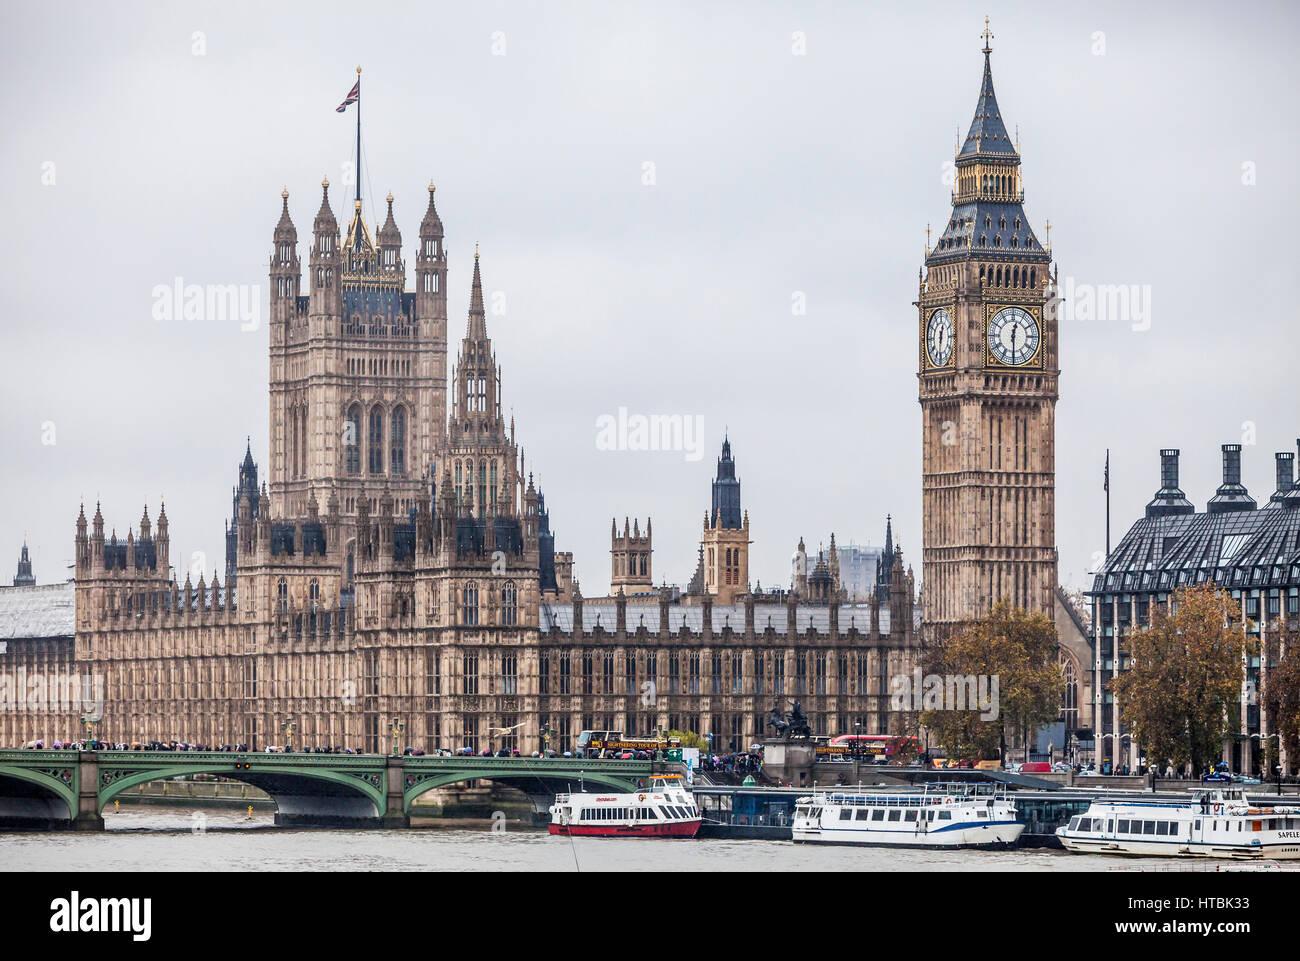 The Palace of Westminster, London, UK including Big Ben, Victoria Tower, Westminster Bridge, Elizabeth Tower, River - Stock Image